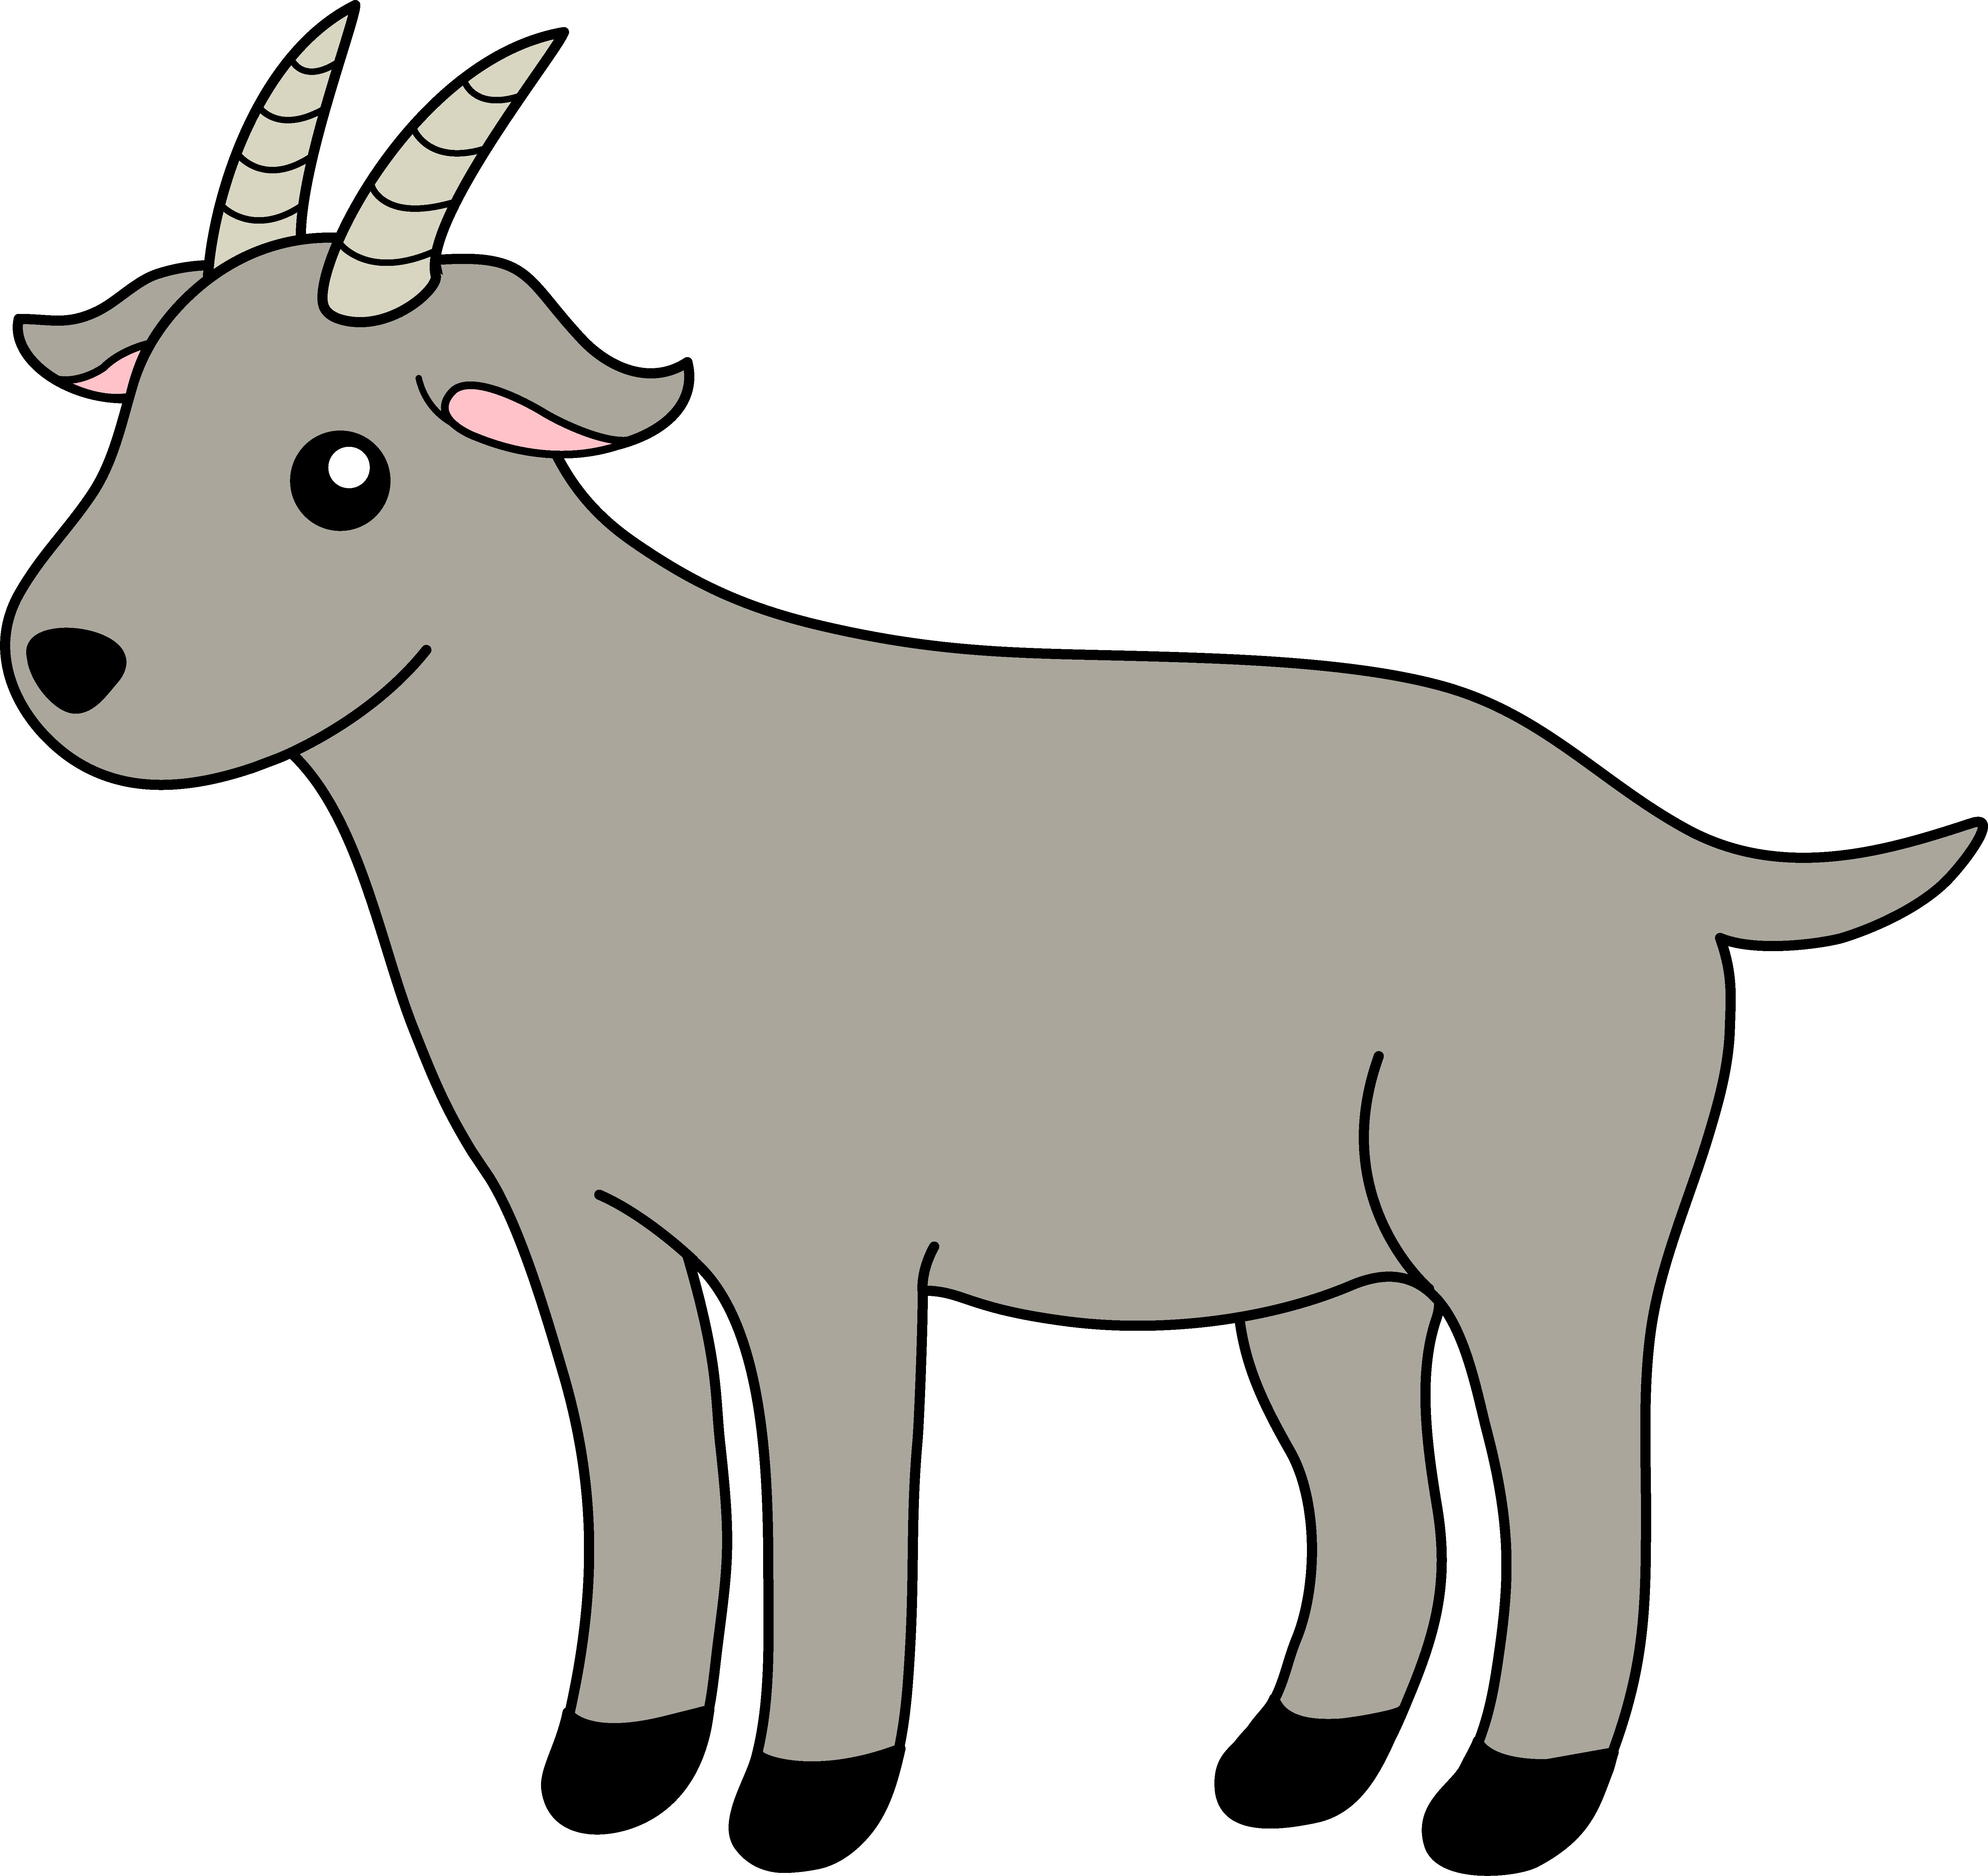 Kid goat clipart.